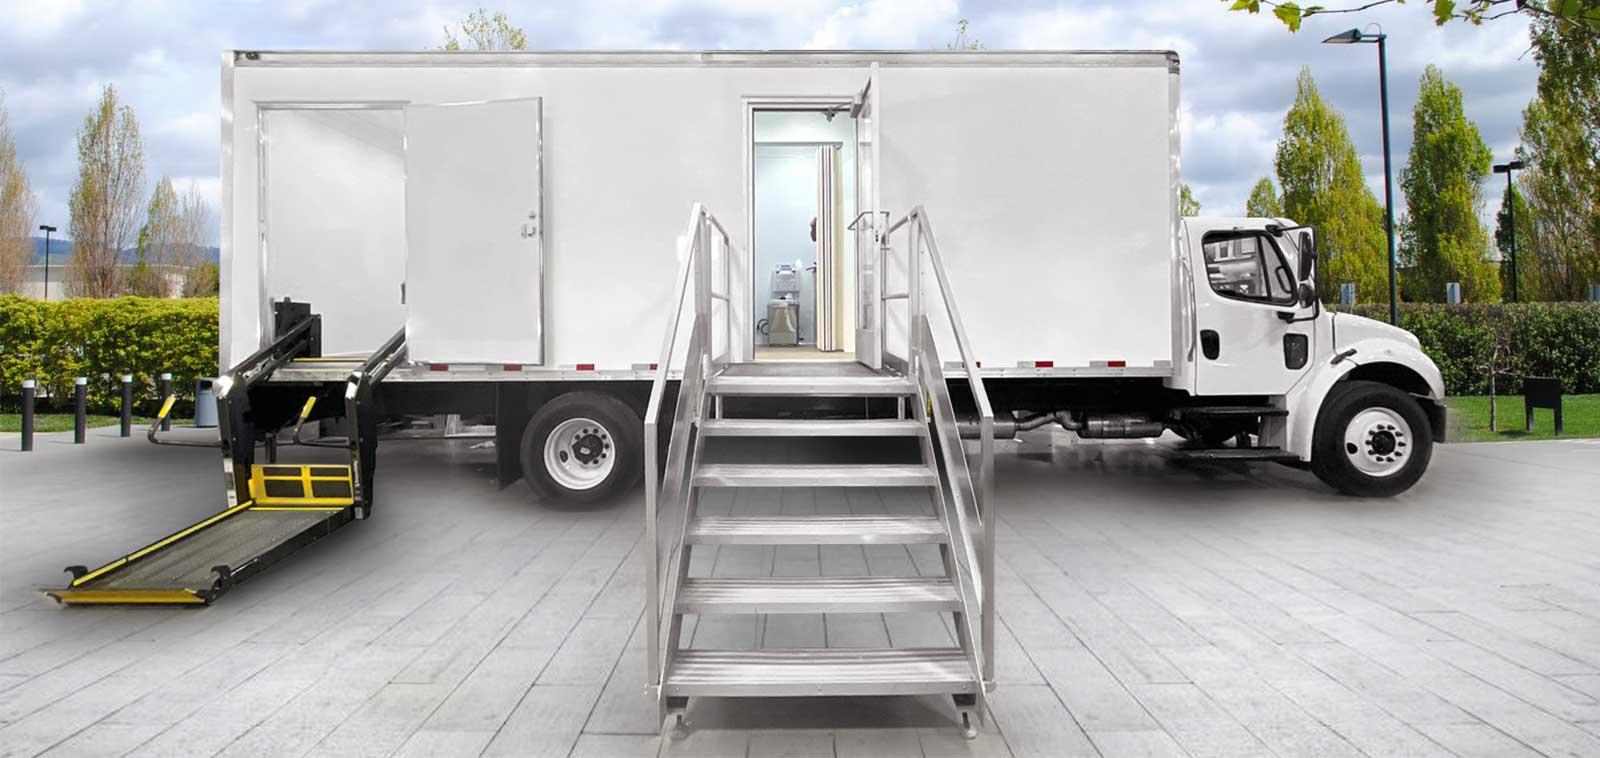 Plan_A_Medical_Box_Truck_1